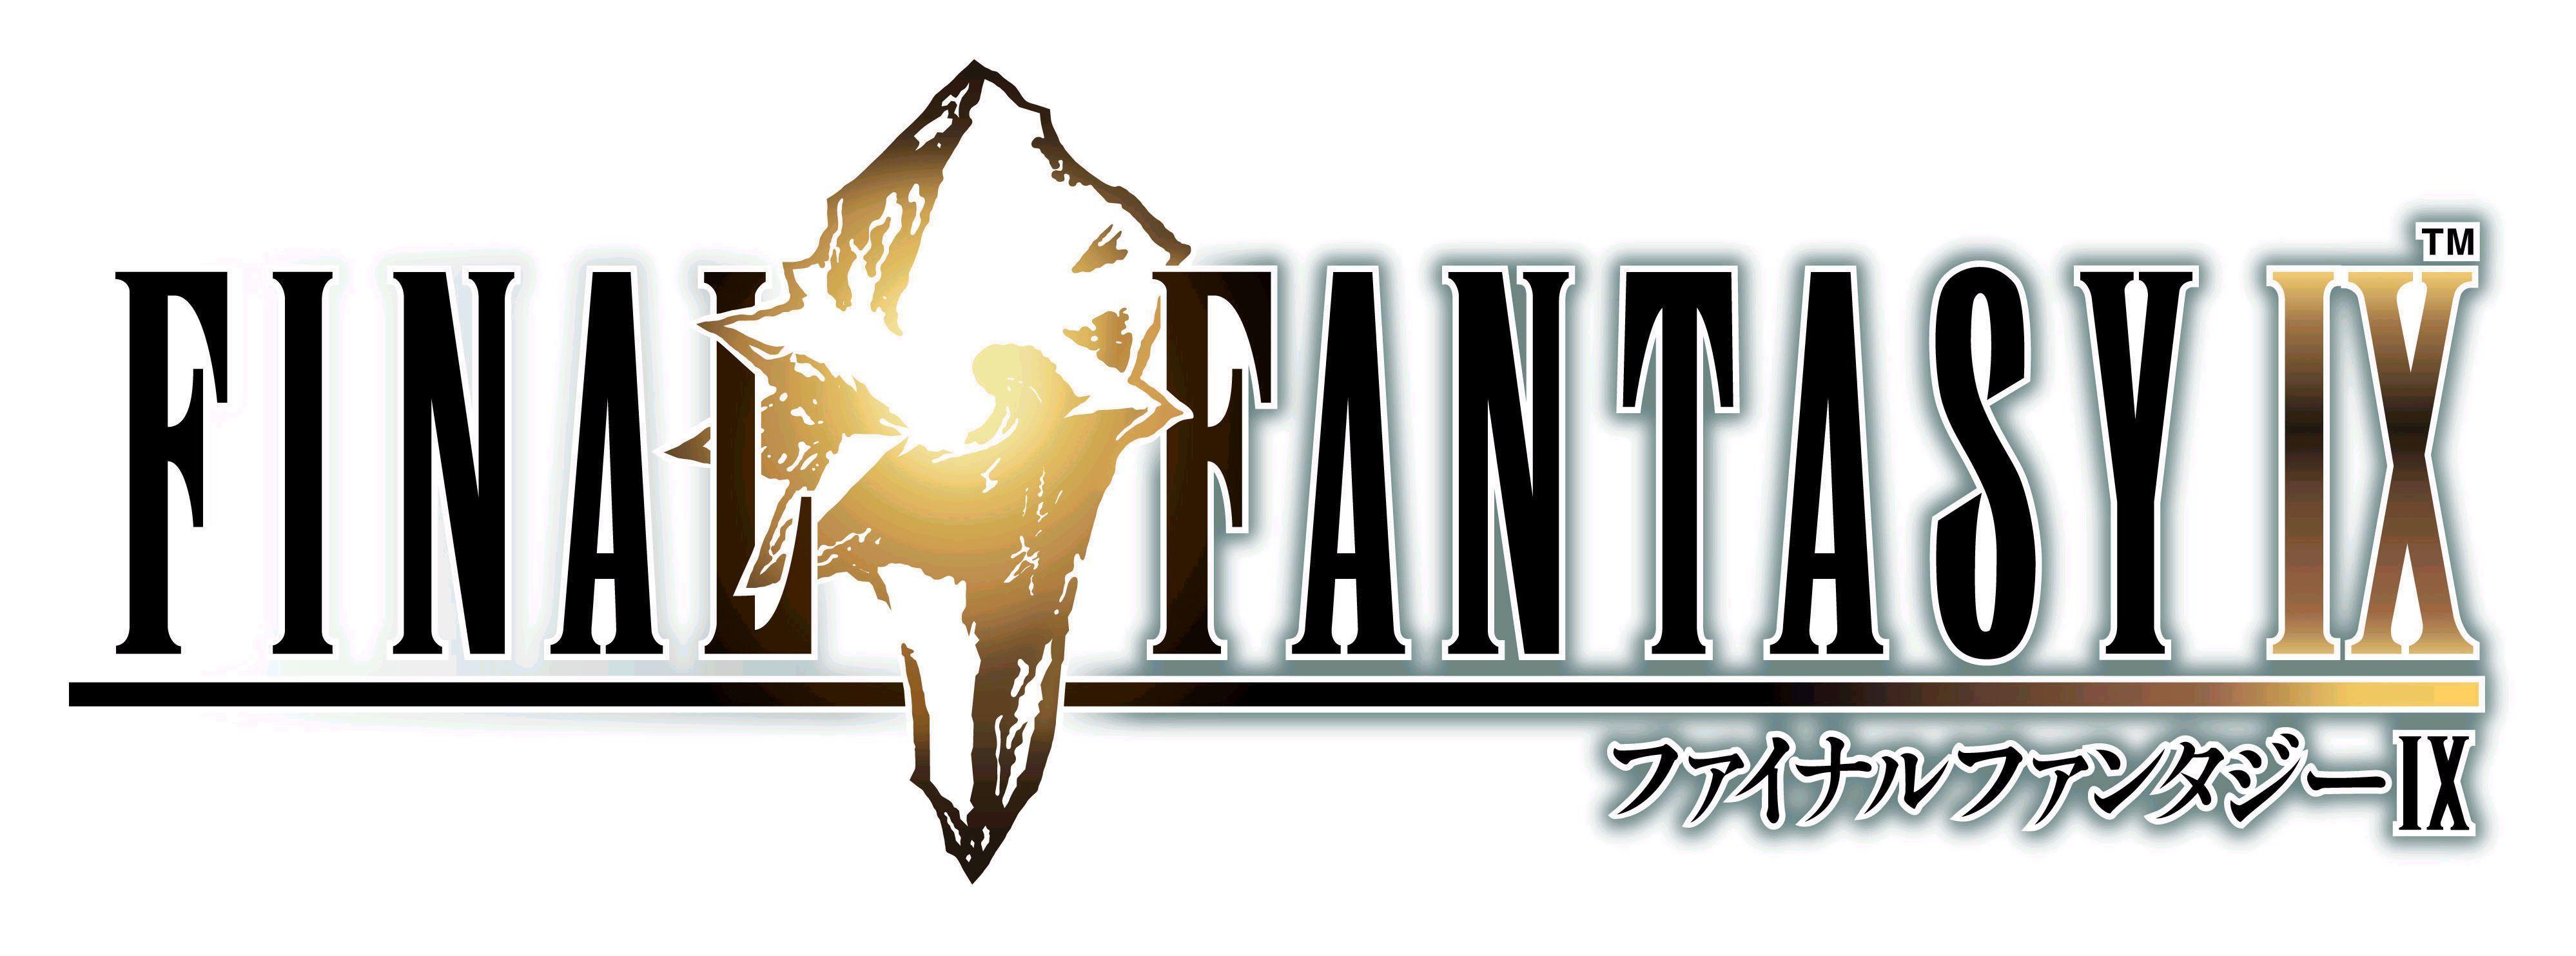 09._final_fantasy_ix.jpg (3996×1483)